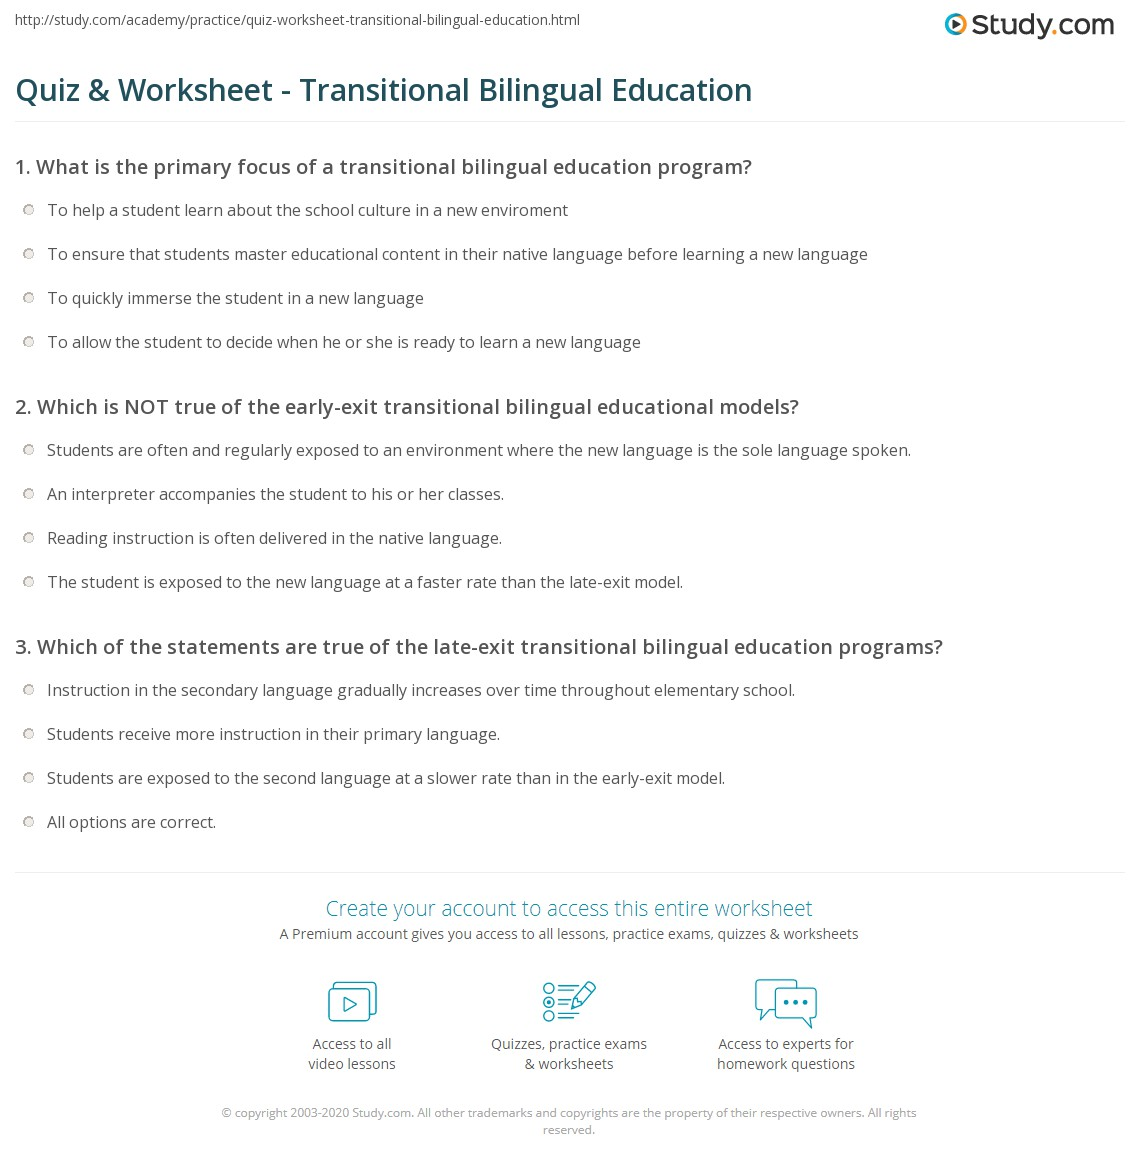 Return to Bilingual Education